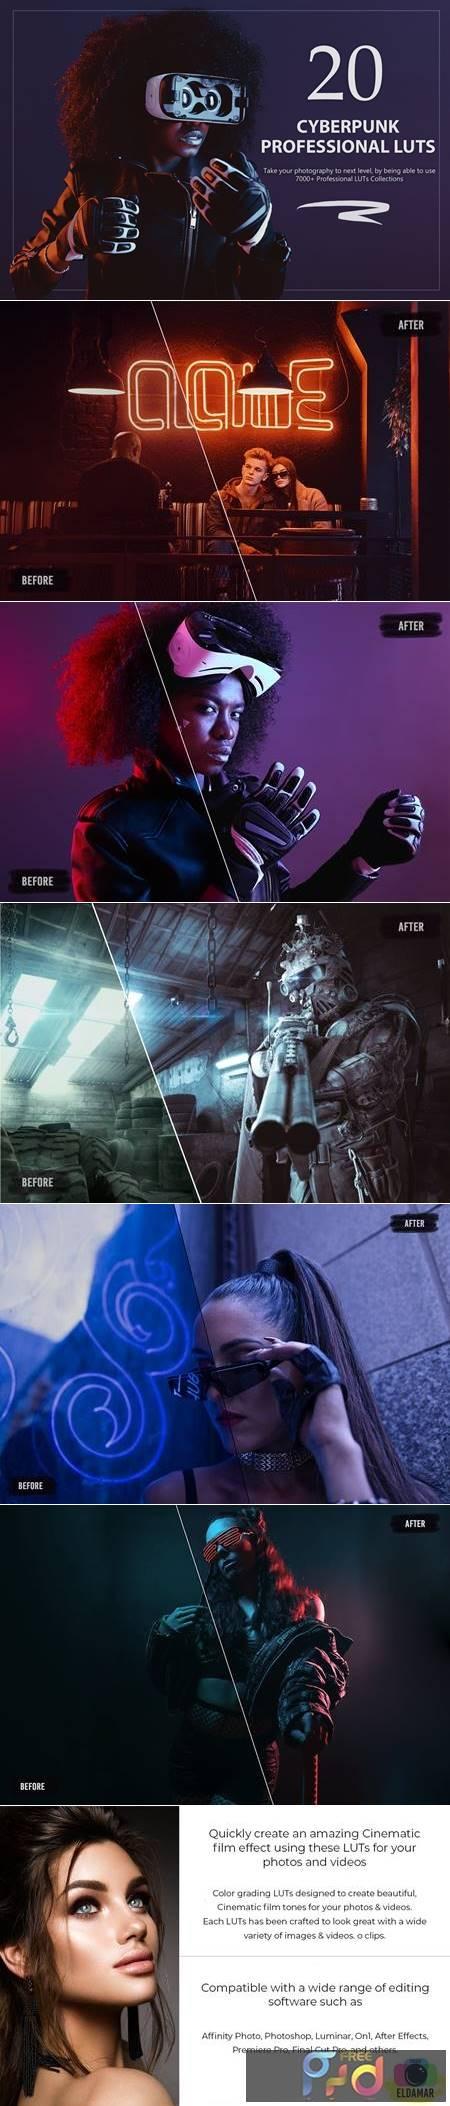 20 Cyberpunk LUTs Pack S7JANGE 1